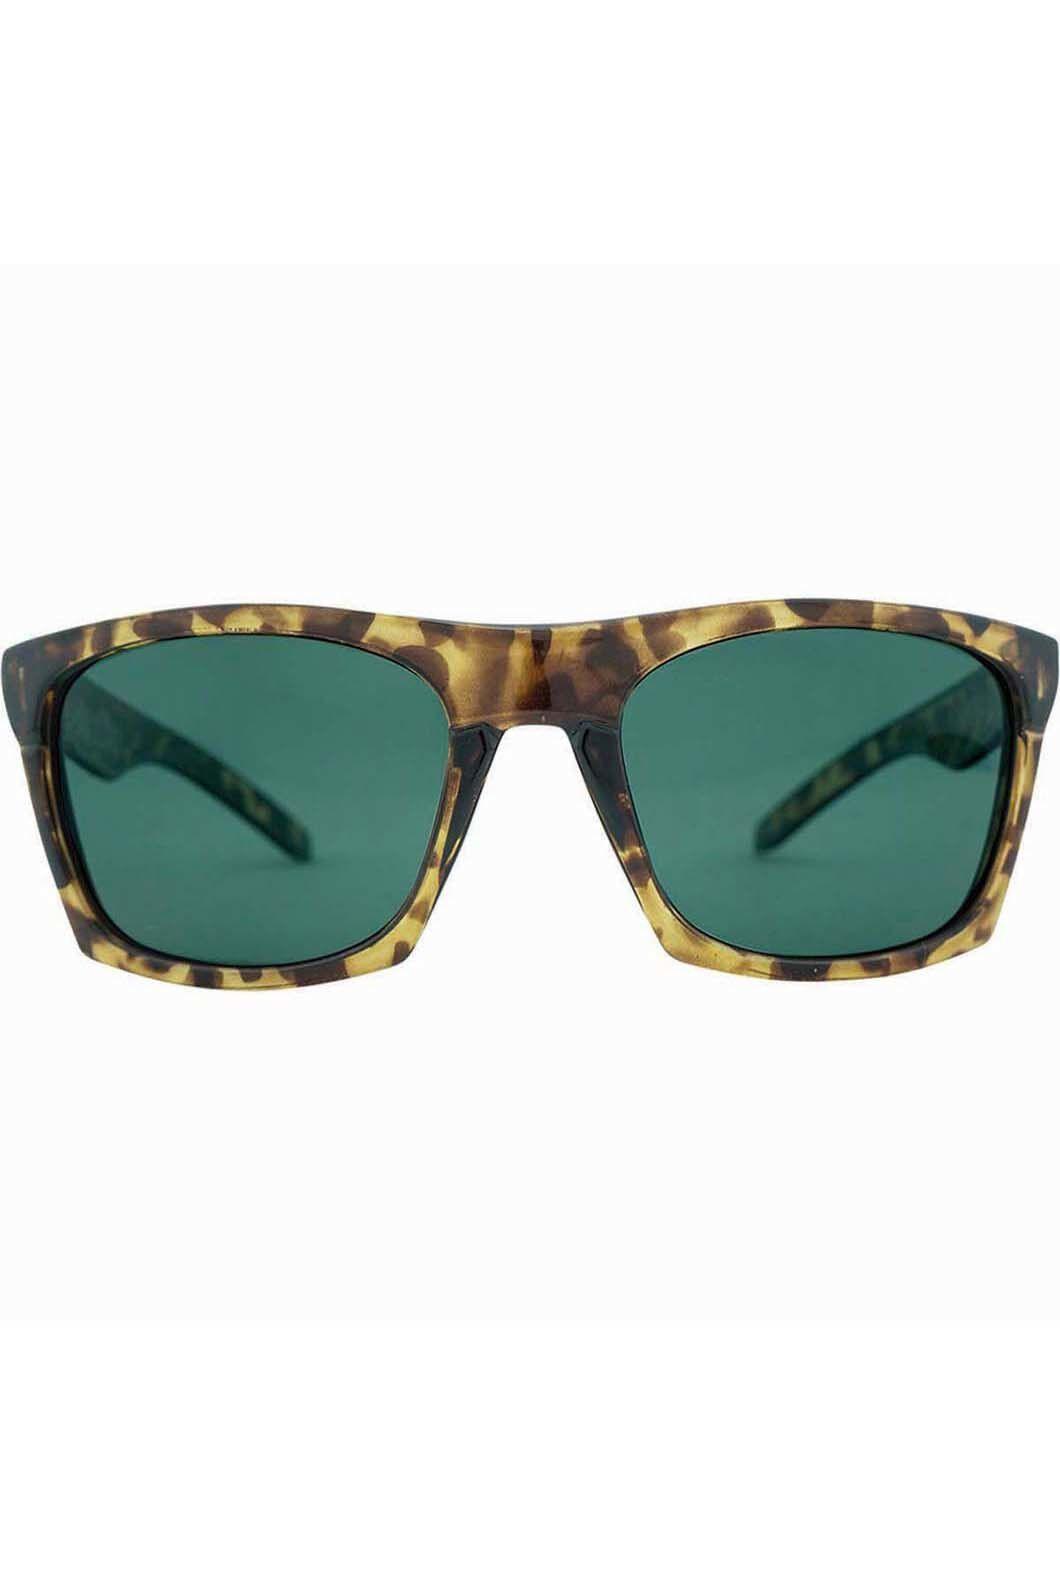 Venture Eyewear Men's Base Camp Sunglasses Matte, DEMI/G15, hi-res